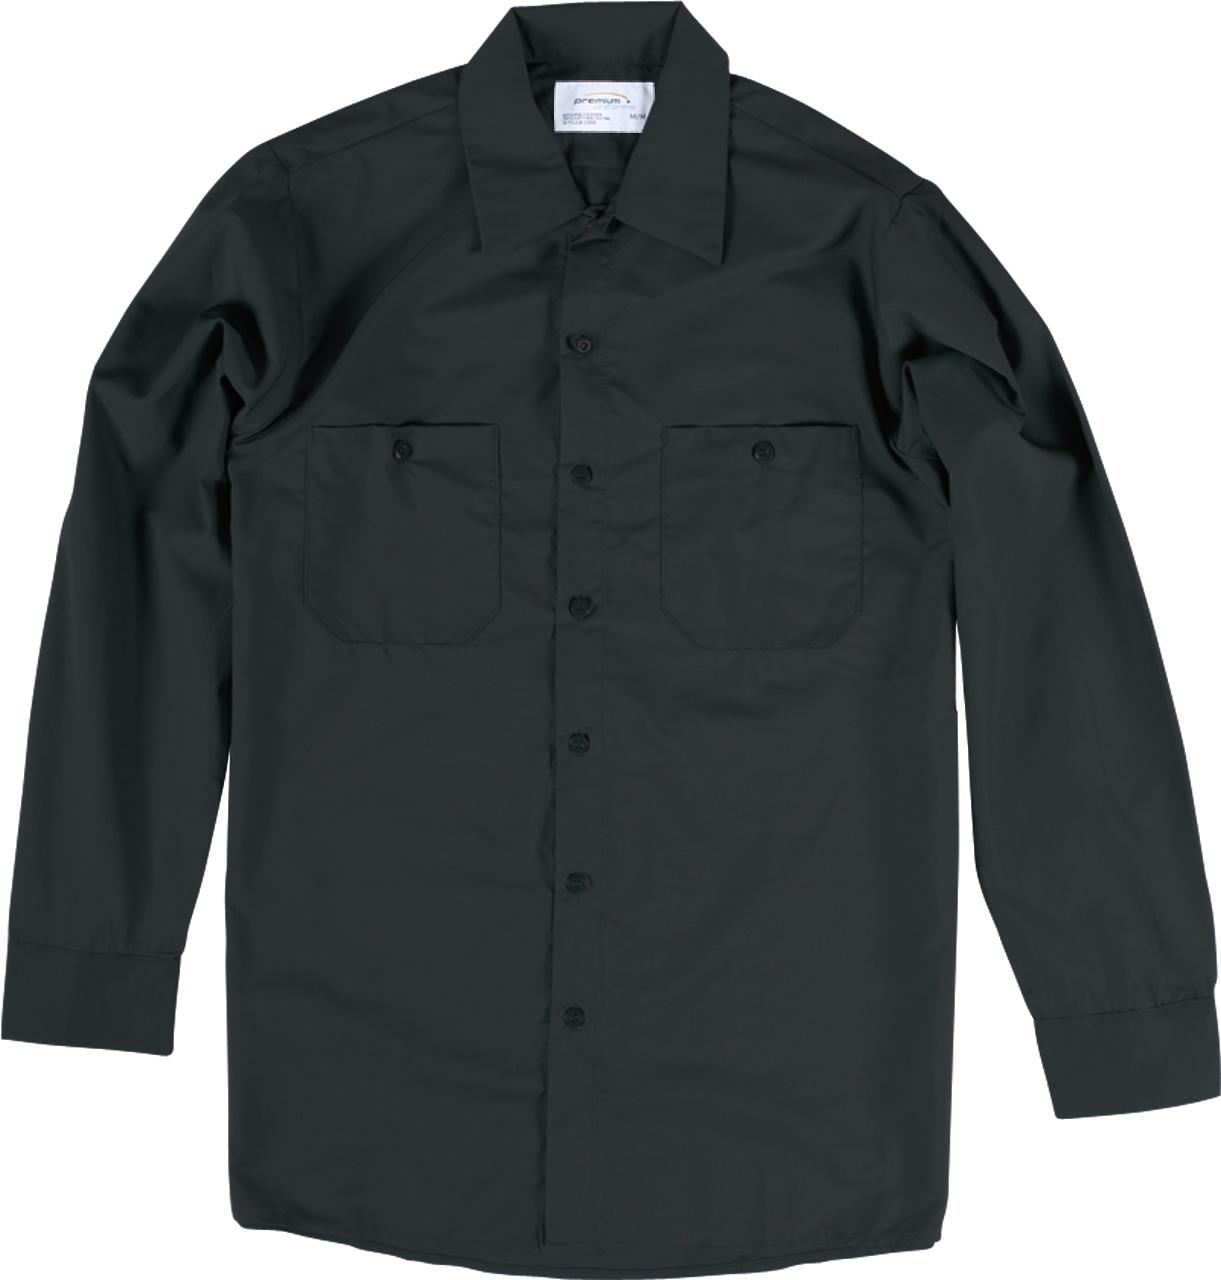 Premium Uniforms Long Sleeve Poly/Cotton Work Shirt